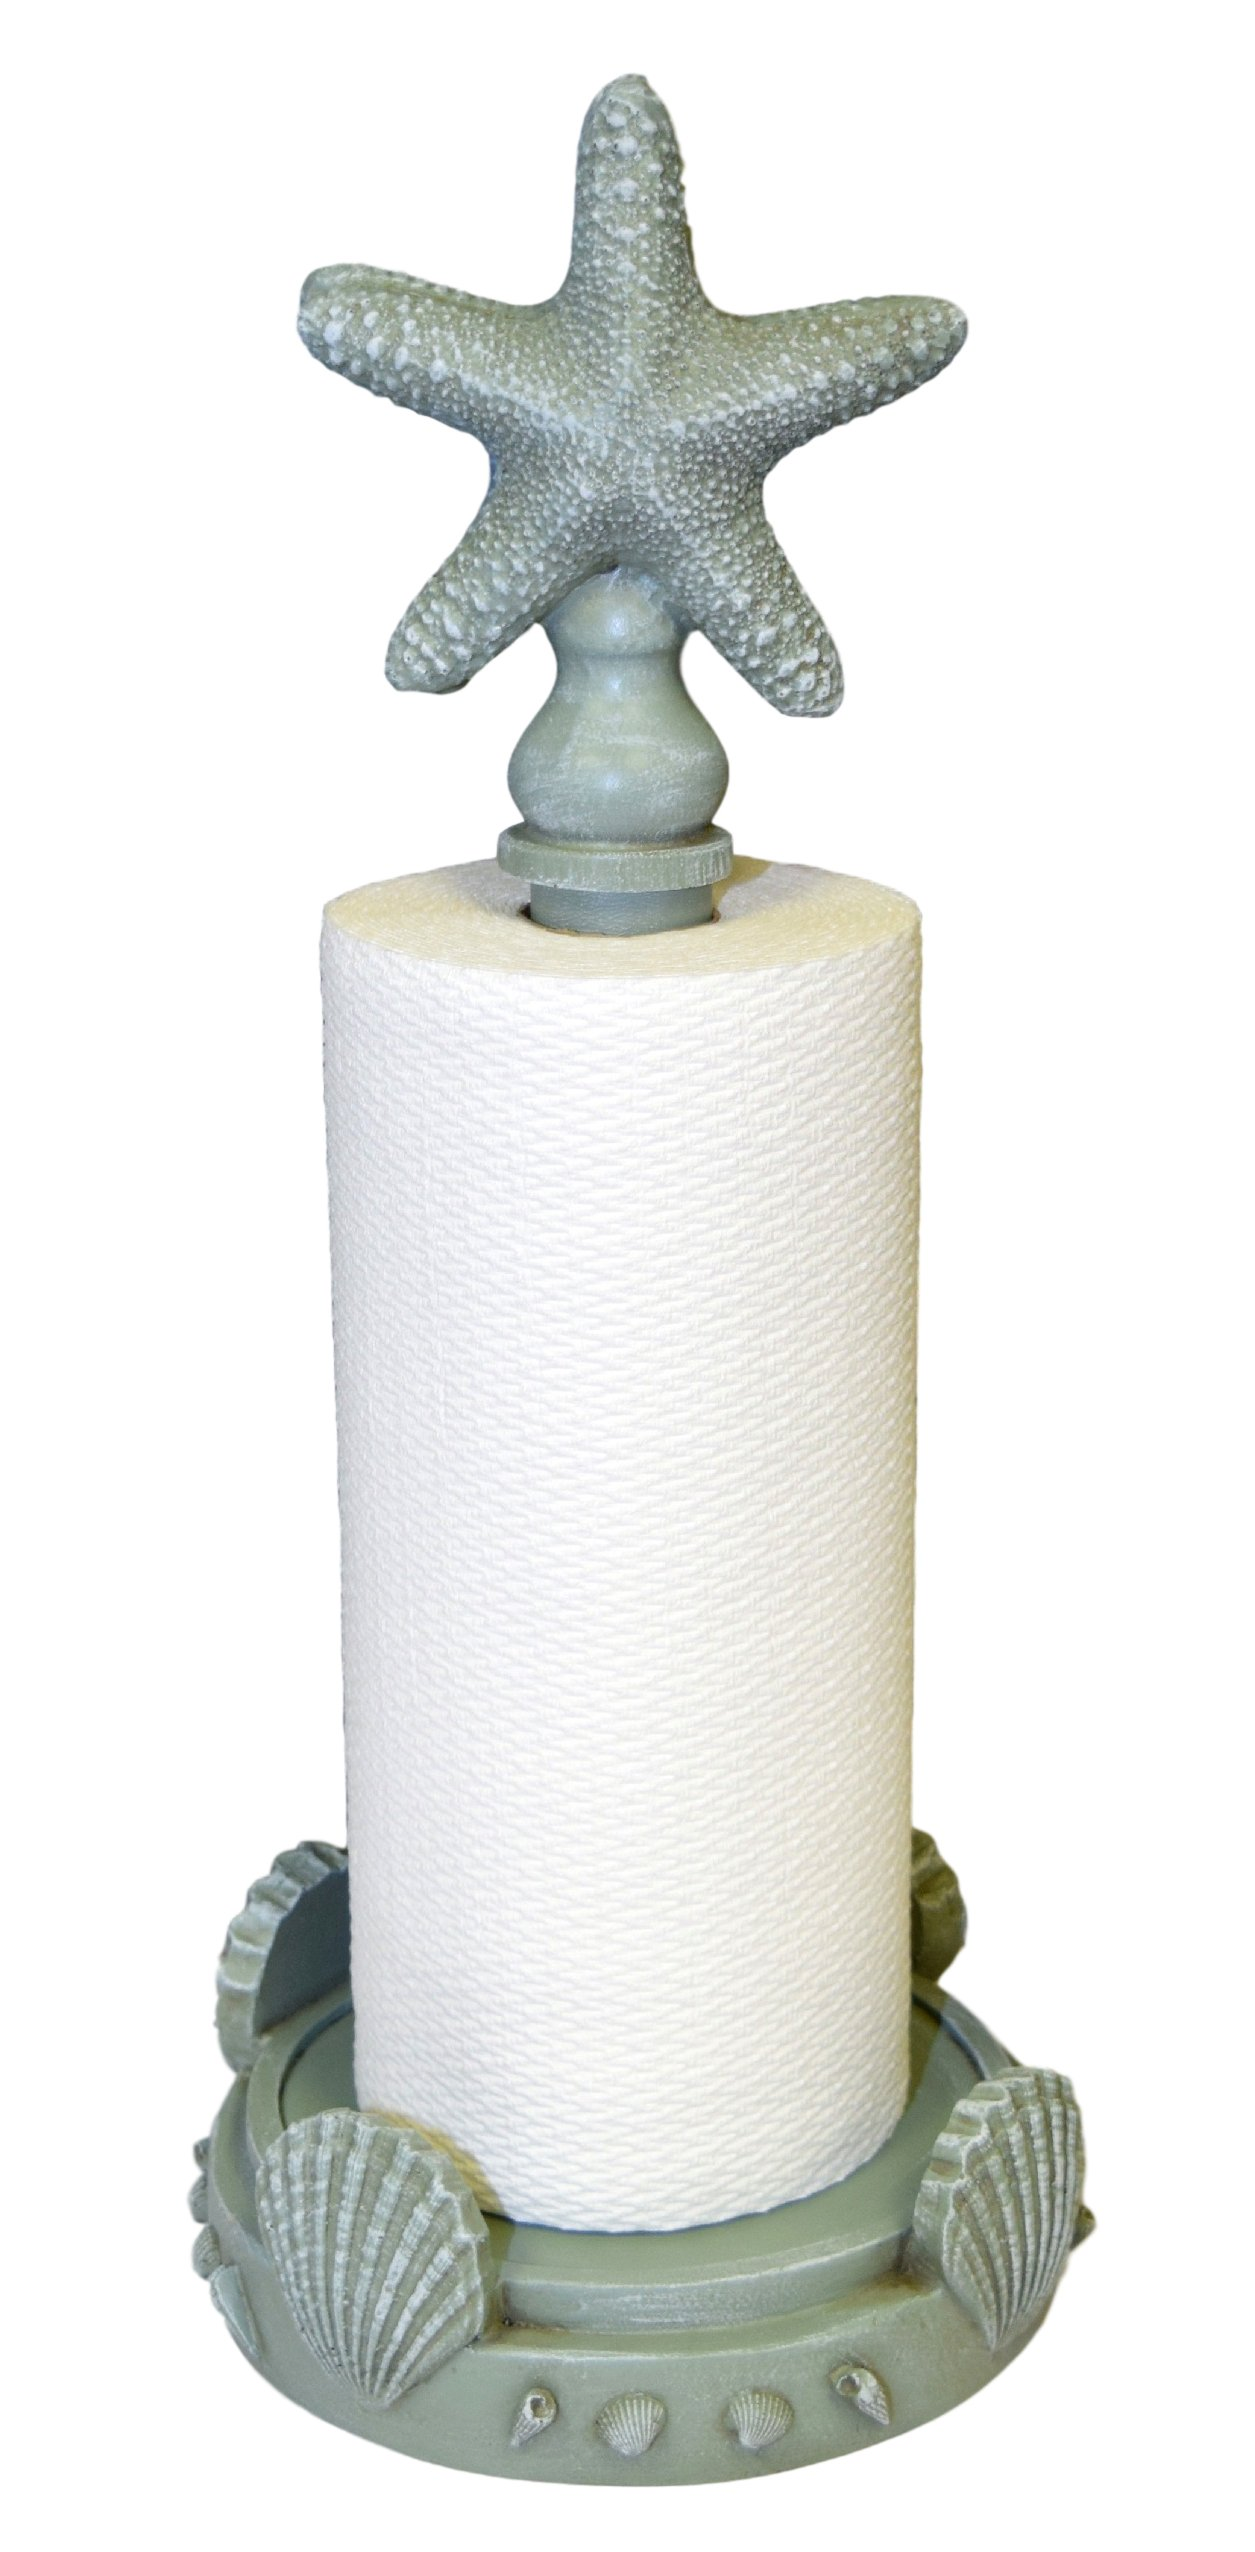 Hickory Manor House Starfish Paper Towel Holder/Seamist Seamiest by Hickory Manor House